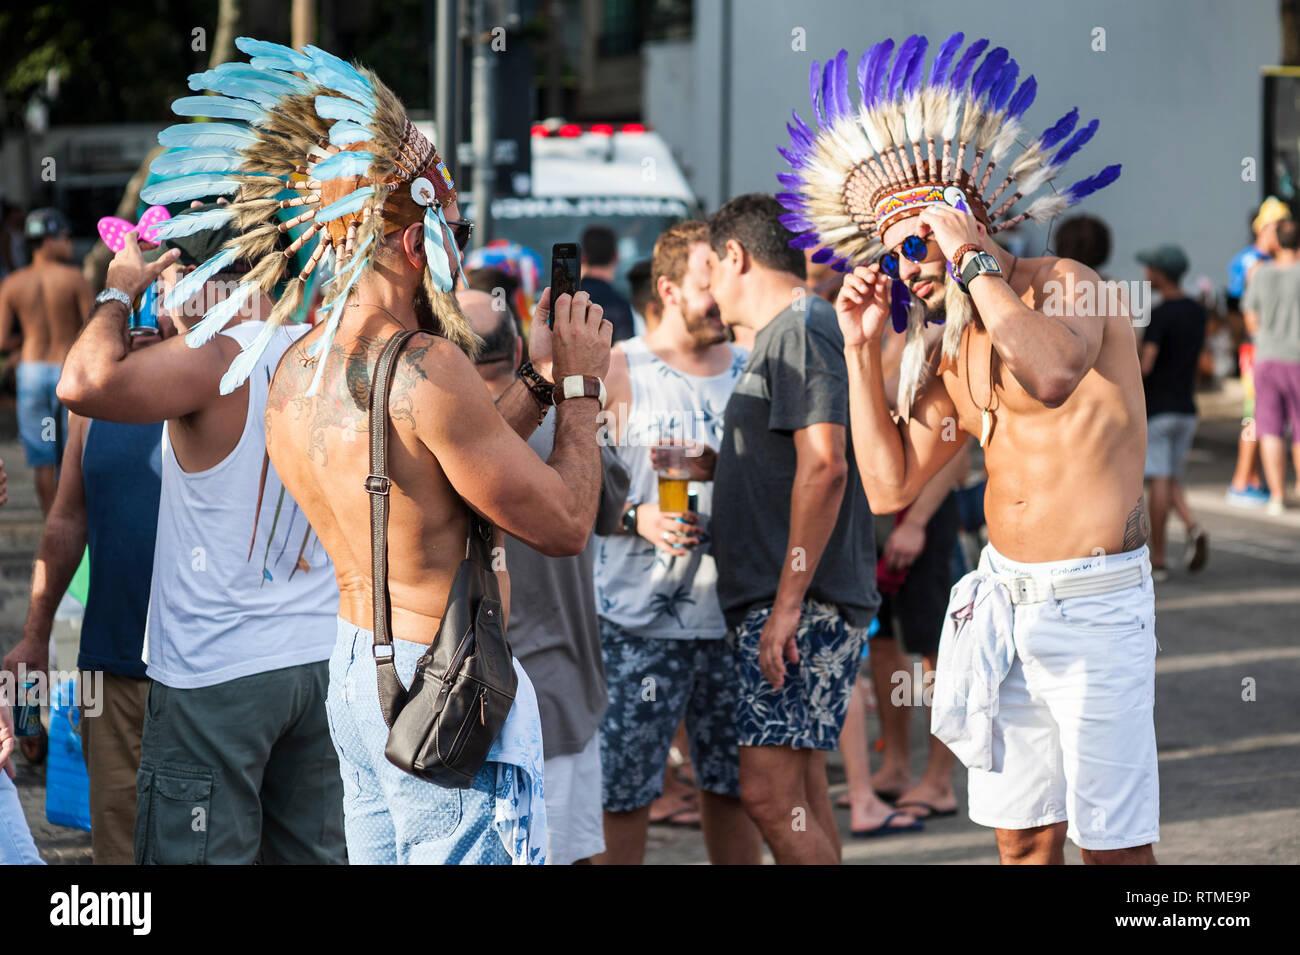 33dcf38f798c RIO DE JANEIRO - 15 de marzo de 2017: Dos jóvenes tatuados hombres ...